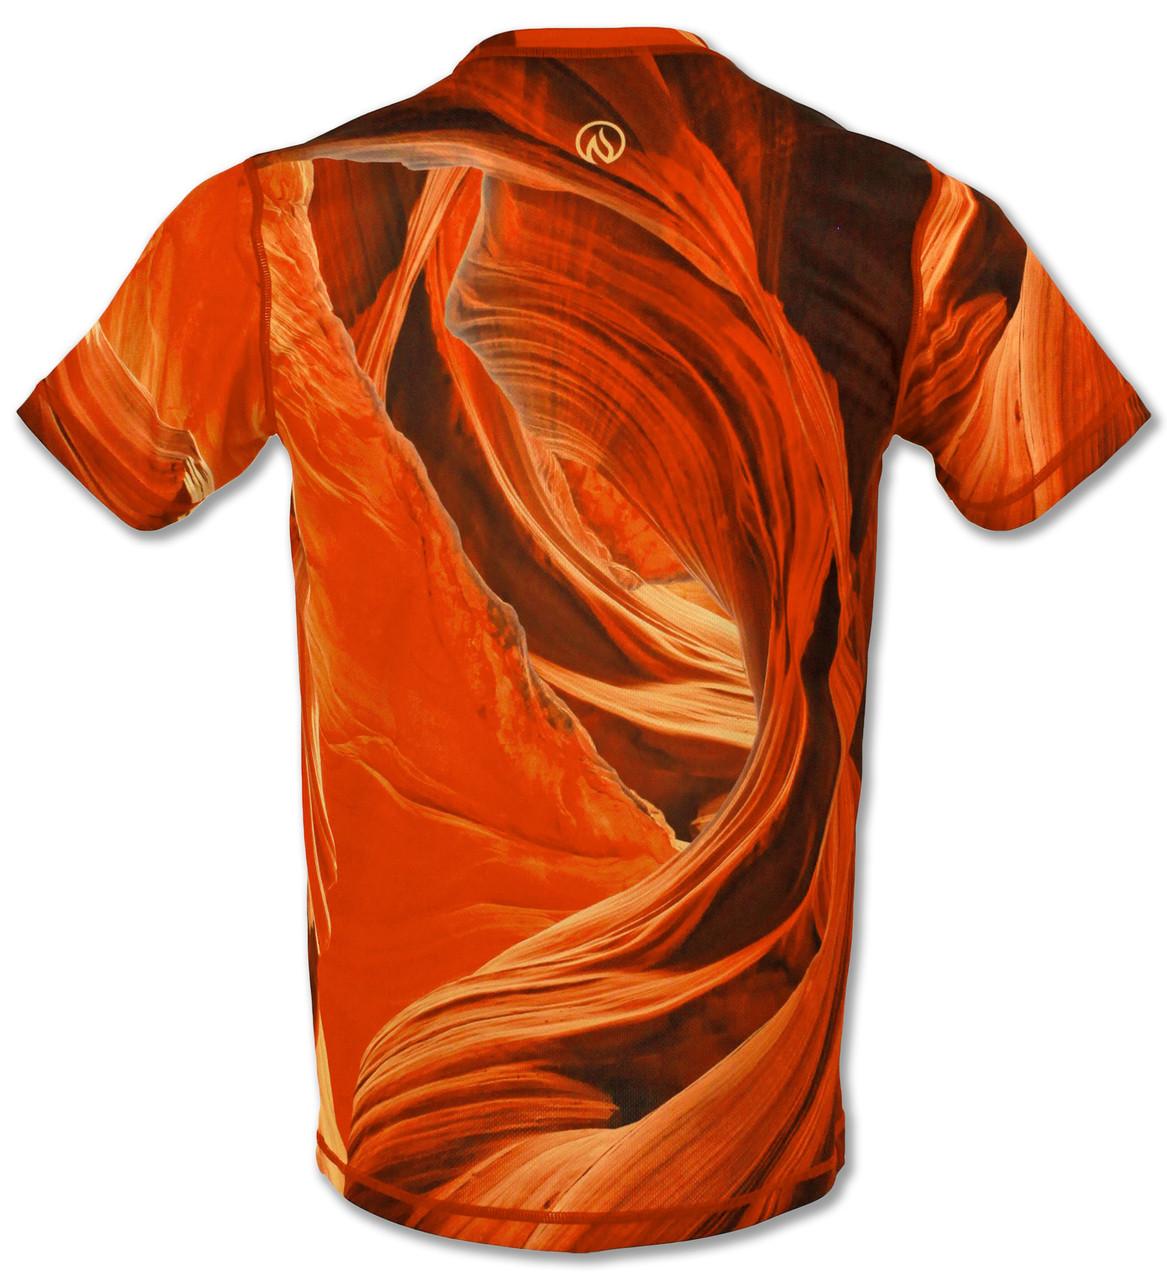 INKnBURN Men's Sandstone Tech Shirt Back